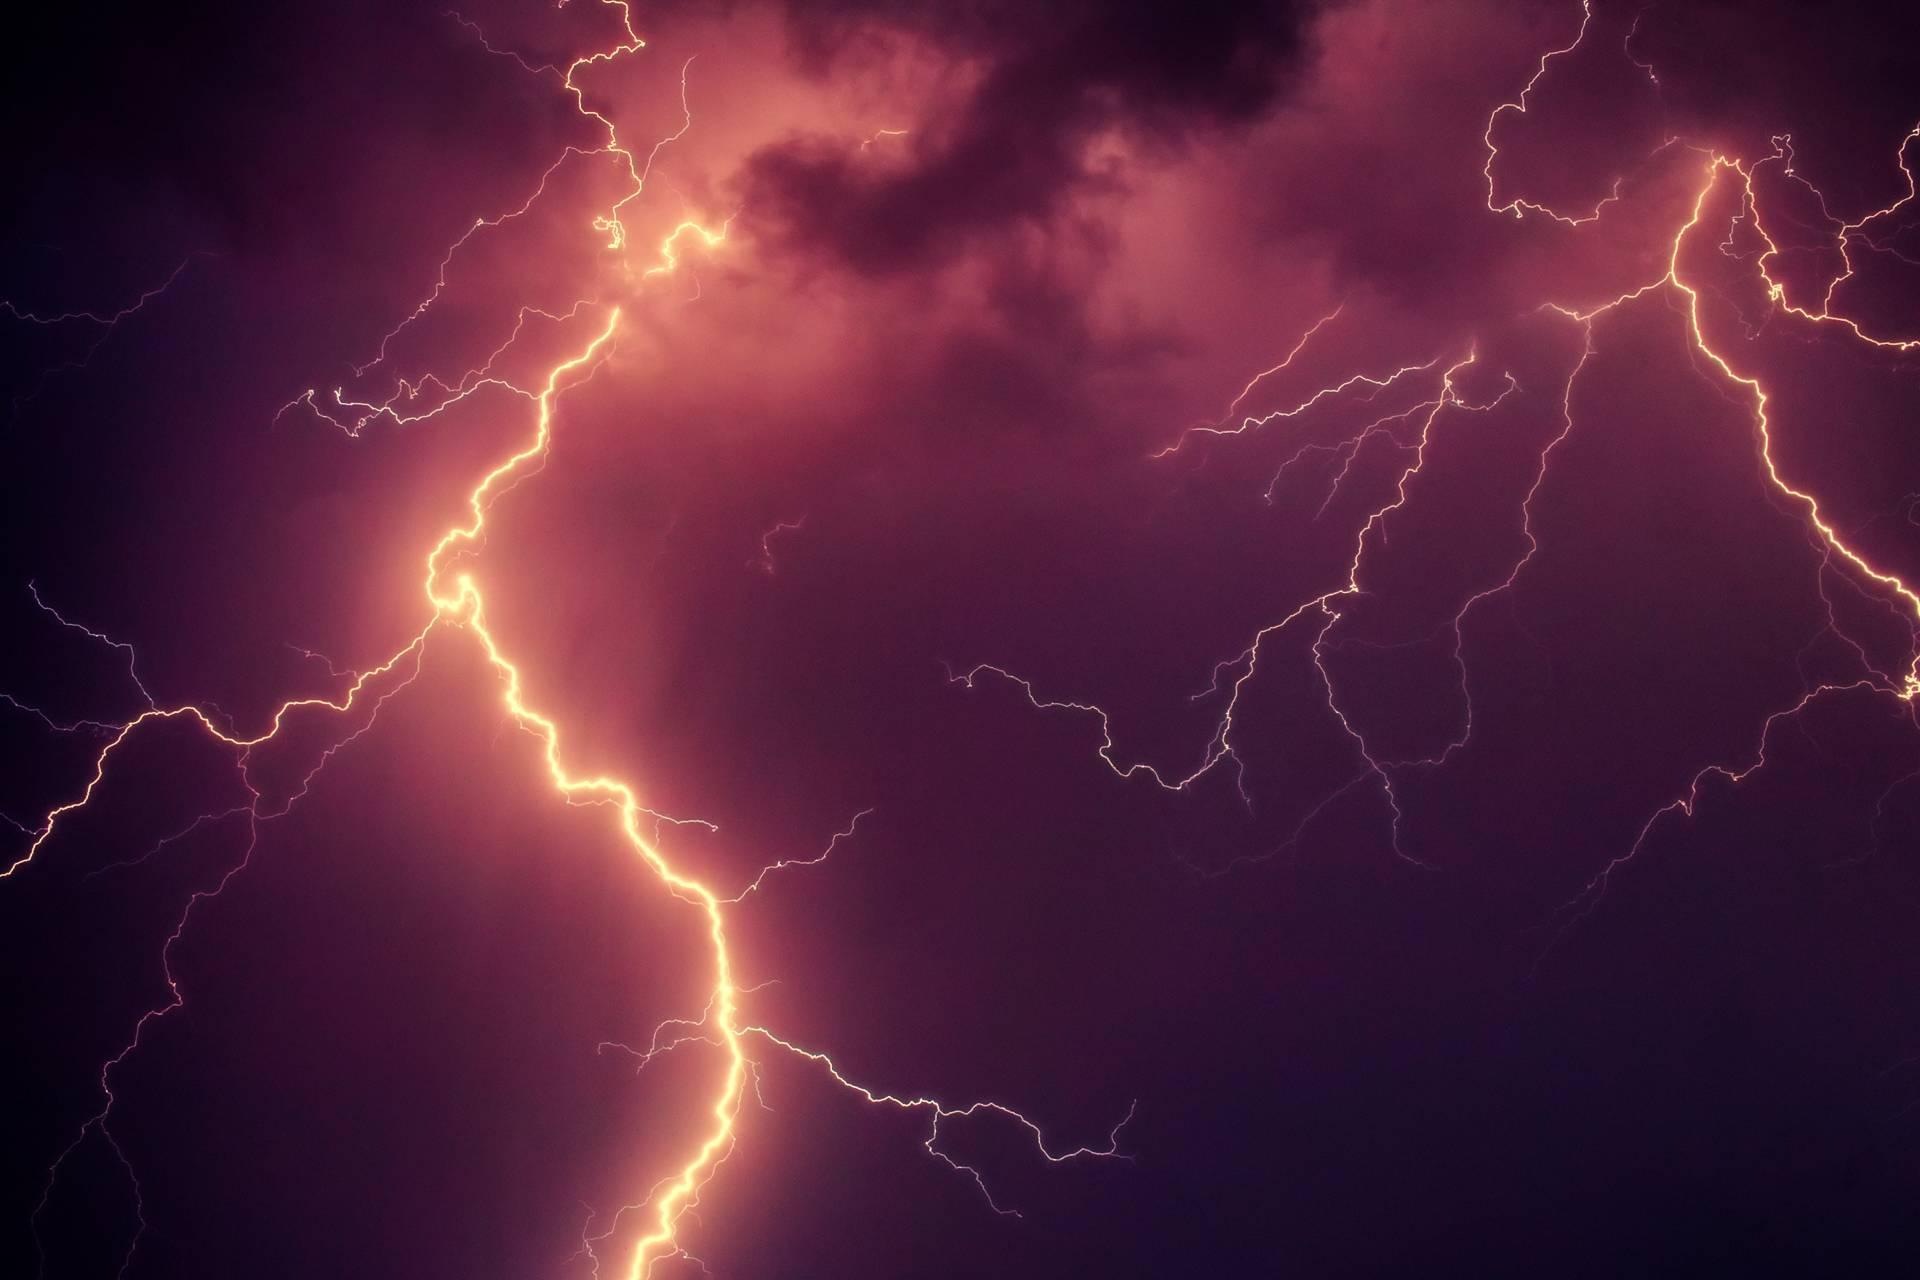 scary lightning wallpaper by z studios aa free on zedge